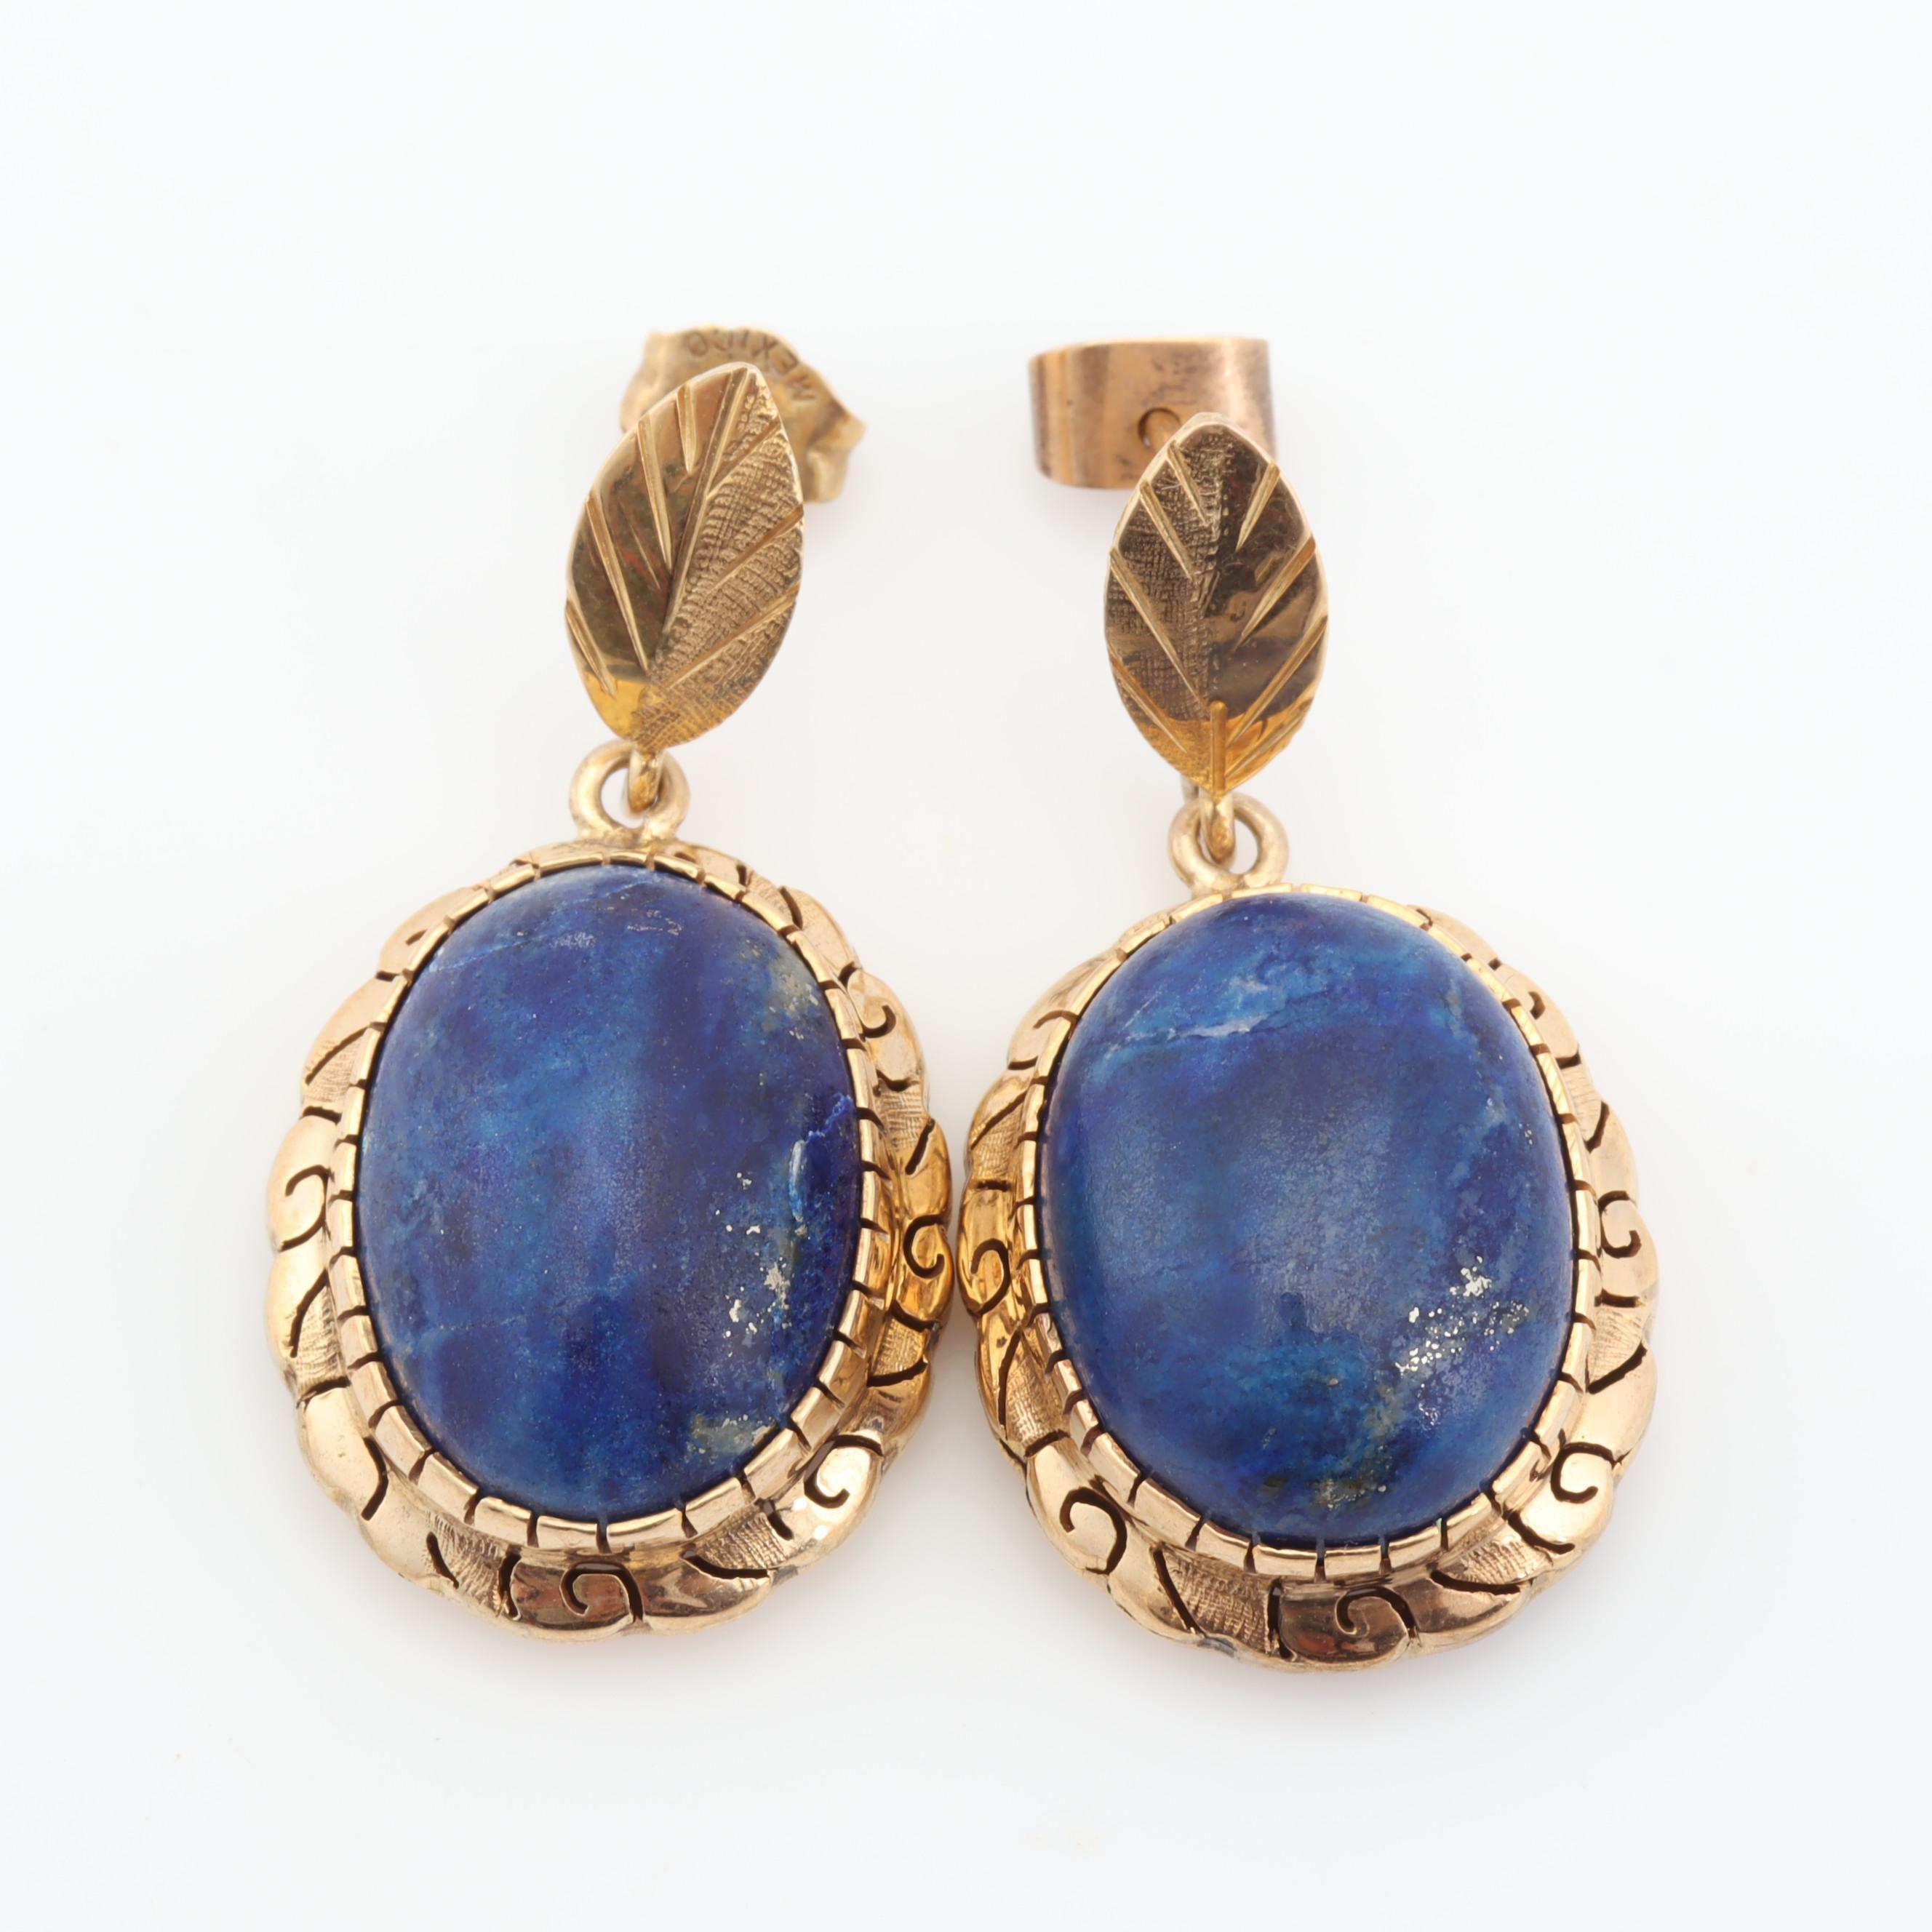 14K Yellow Gold Lapis Lazuli Dangle Earrings